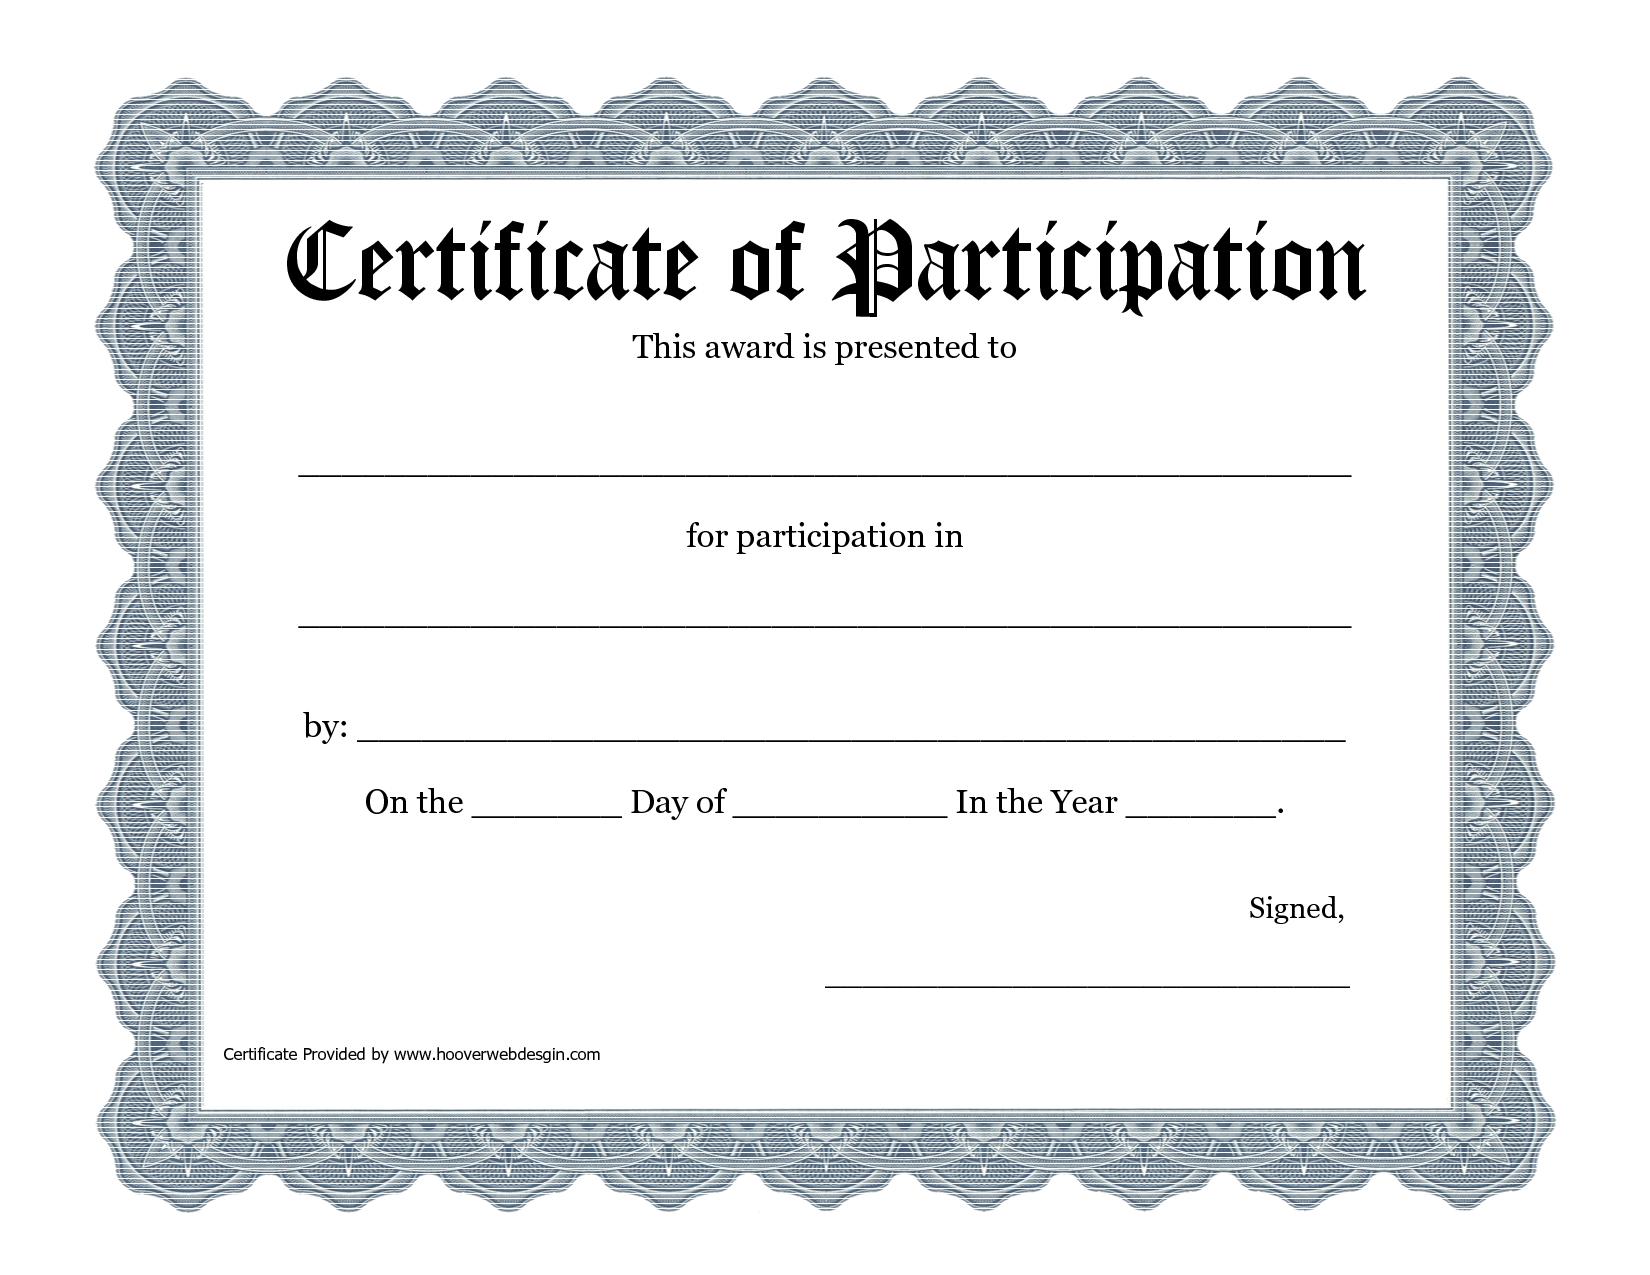 Free Printable Award Certificate Template - Bing Images | 2016 Art - Free Printable Soccer Certificate Templates